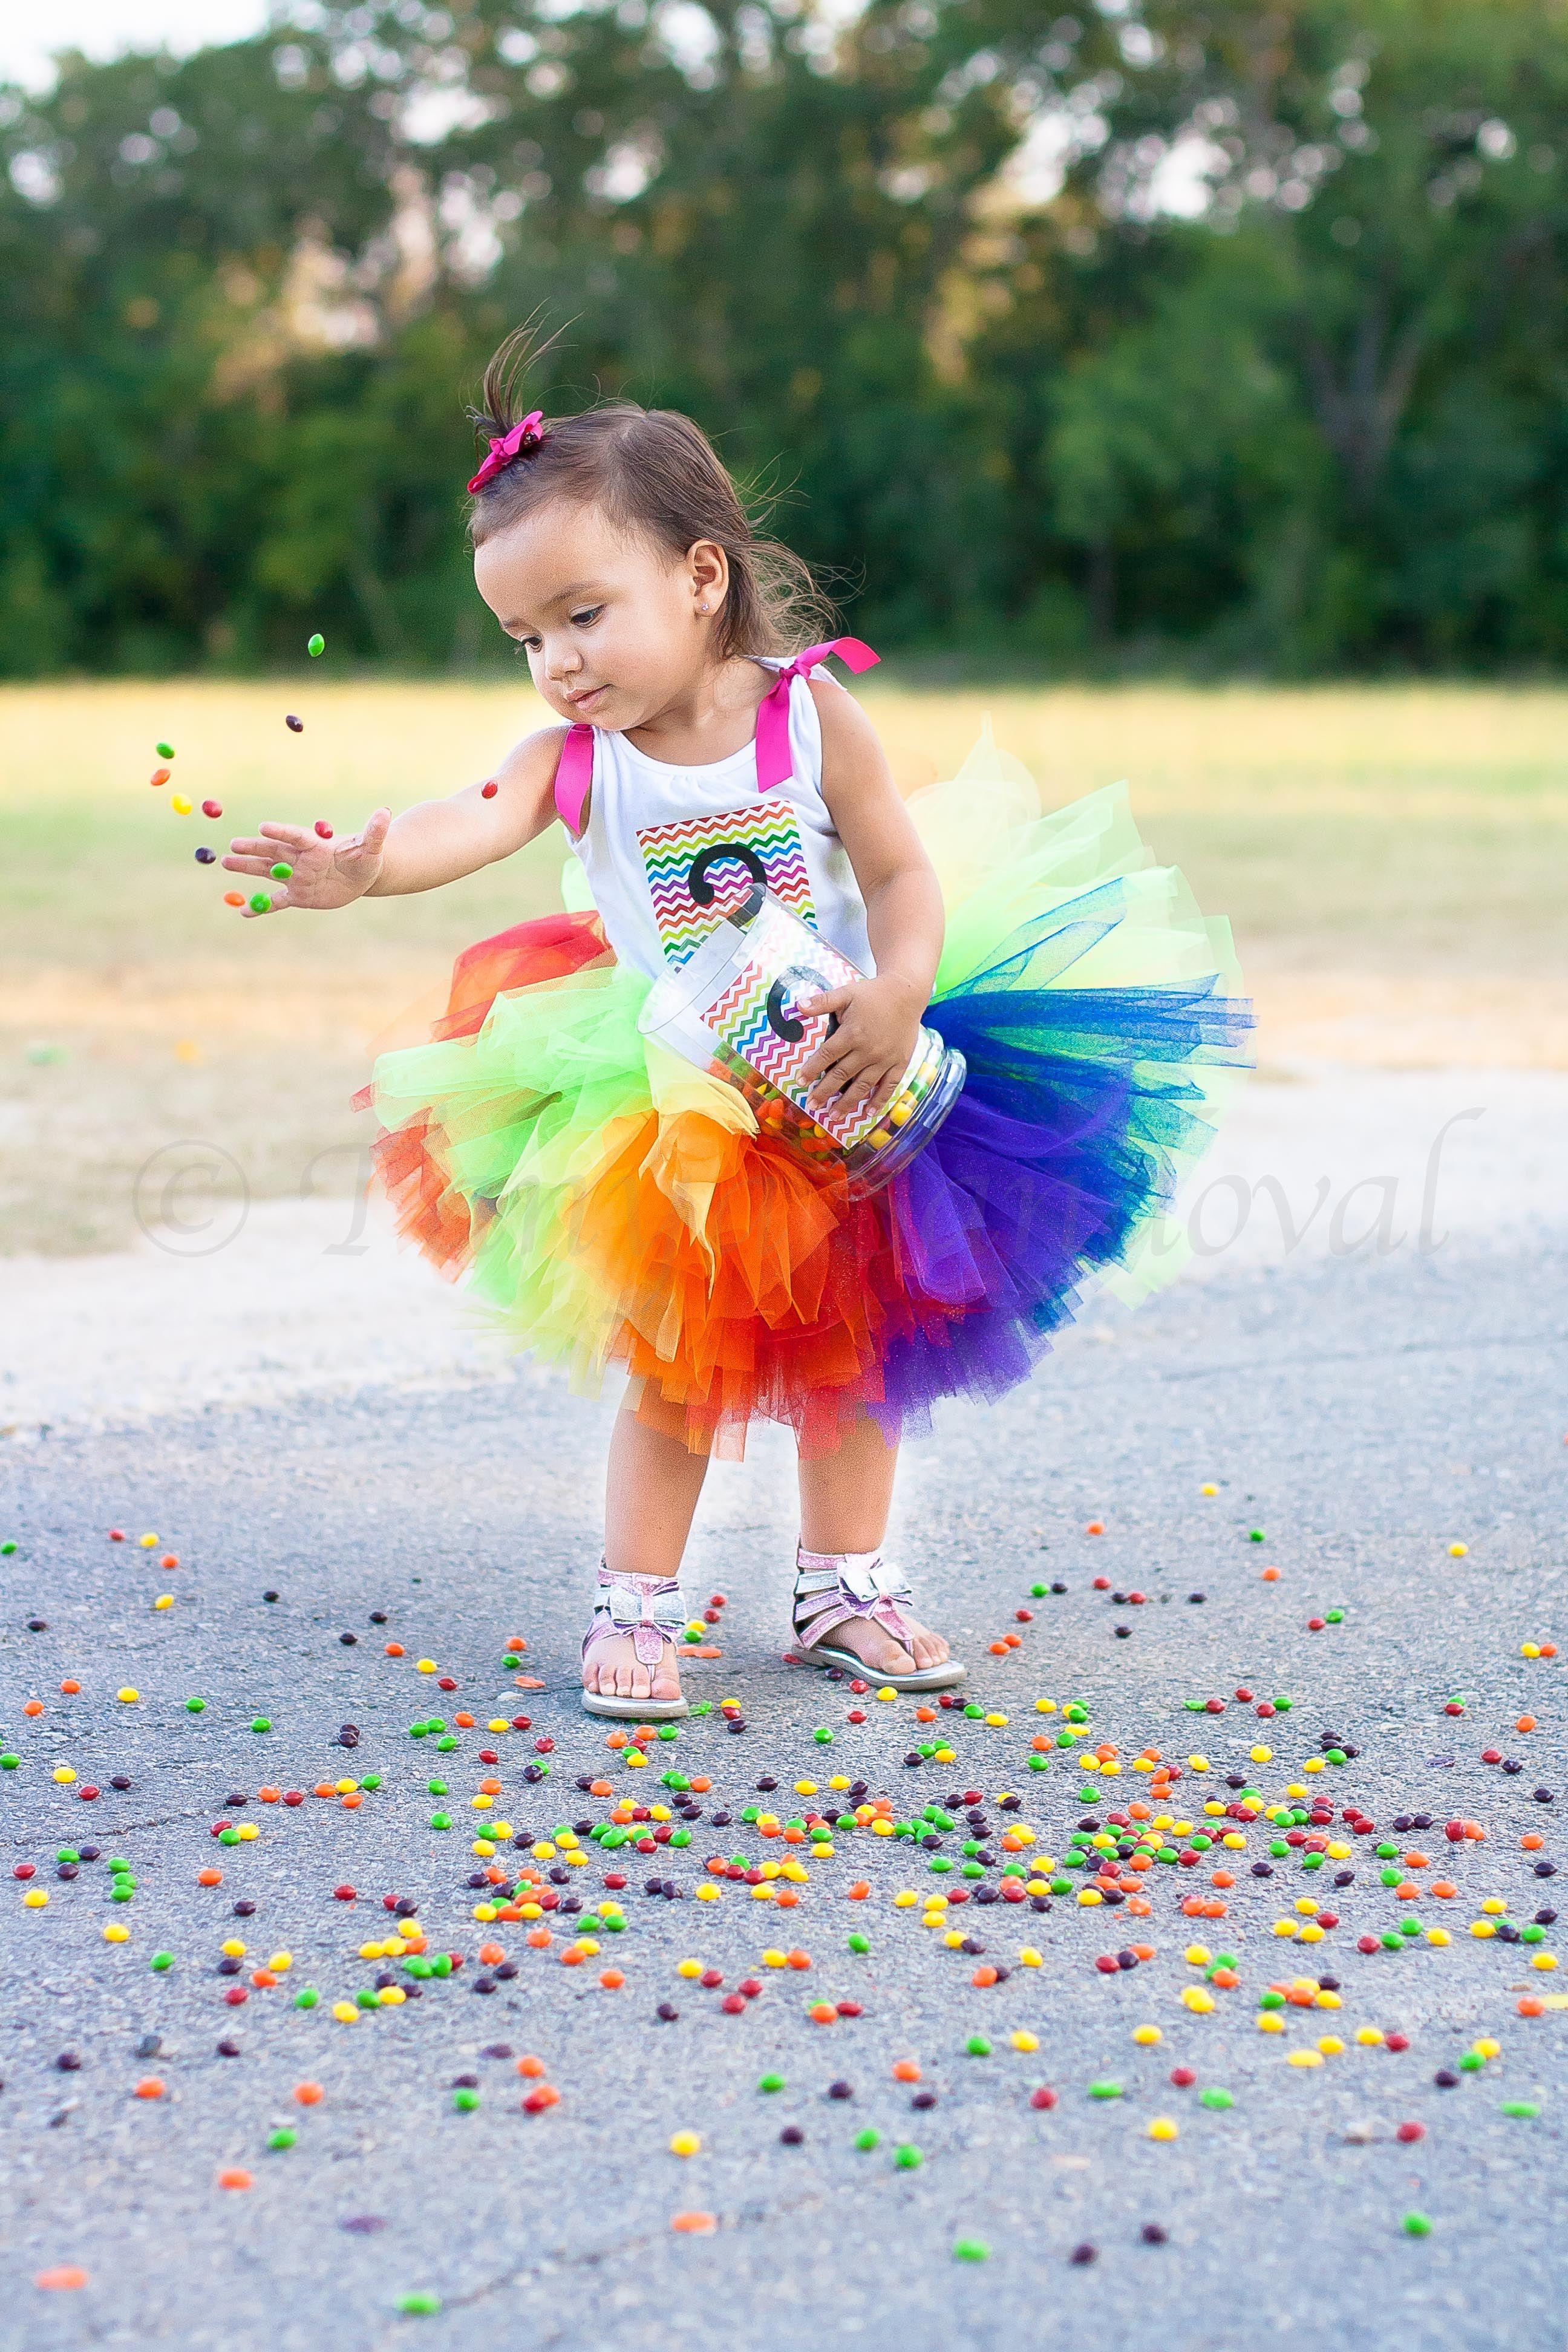 CHILDREN BIRTHDAY WEDDING PARTY DECOR RAINBOW SKITTLES BALLOONS easy KIT